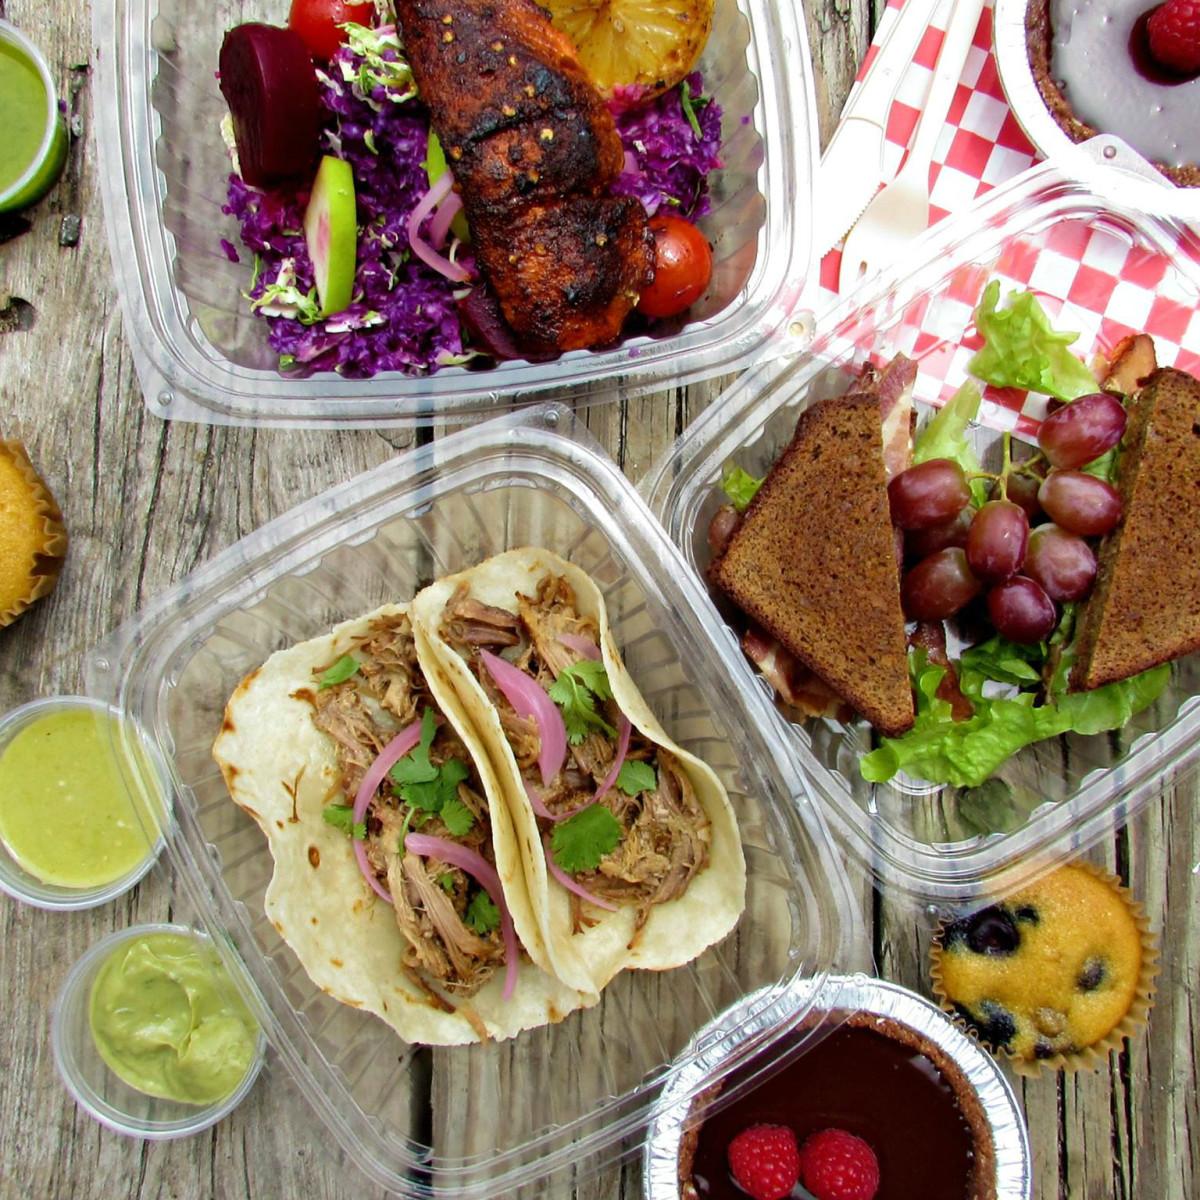 Picnik Austin food trailer paleo gluten free meals